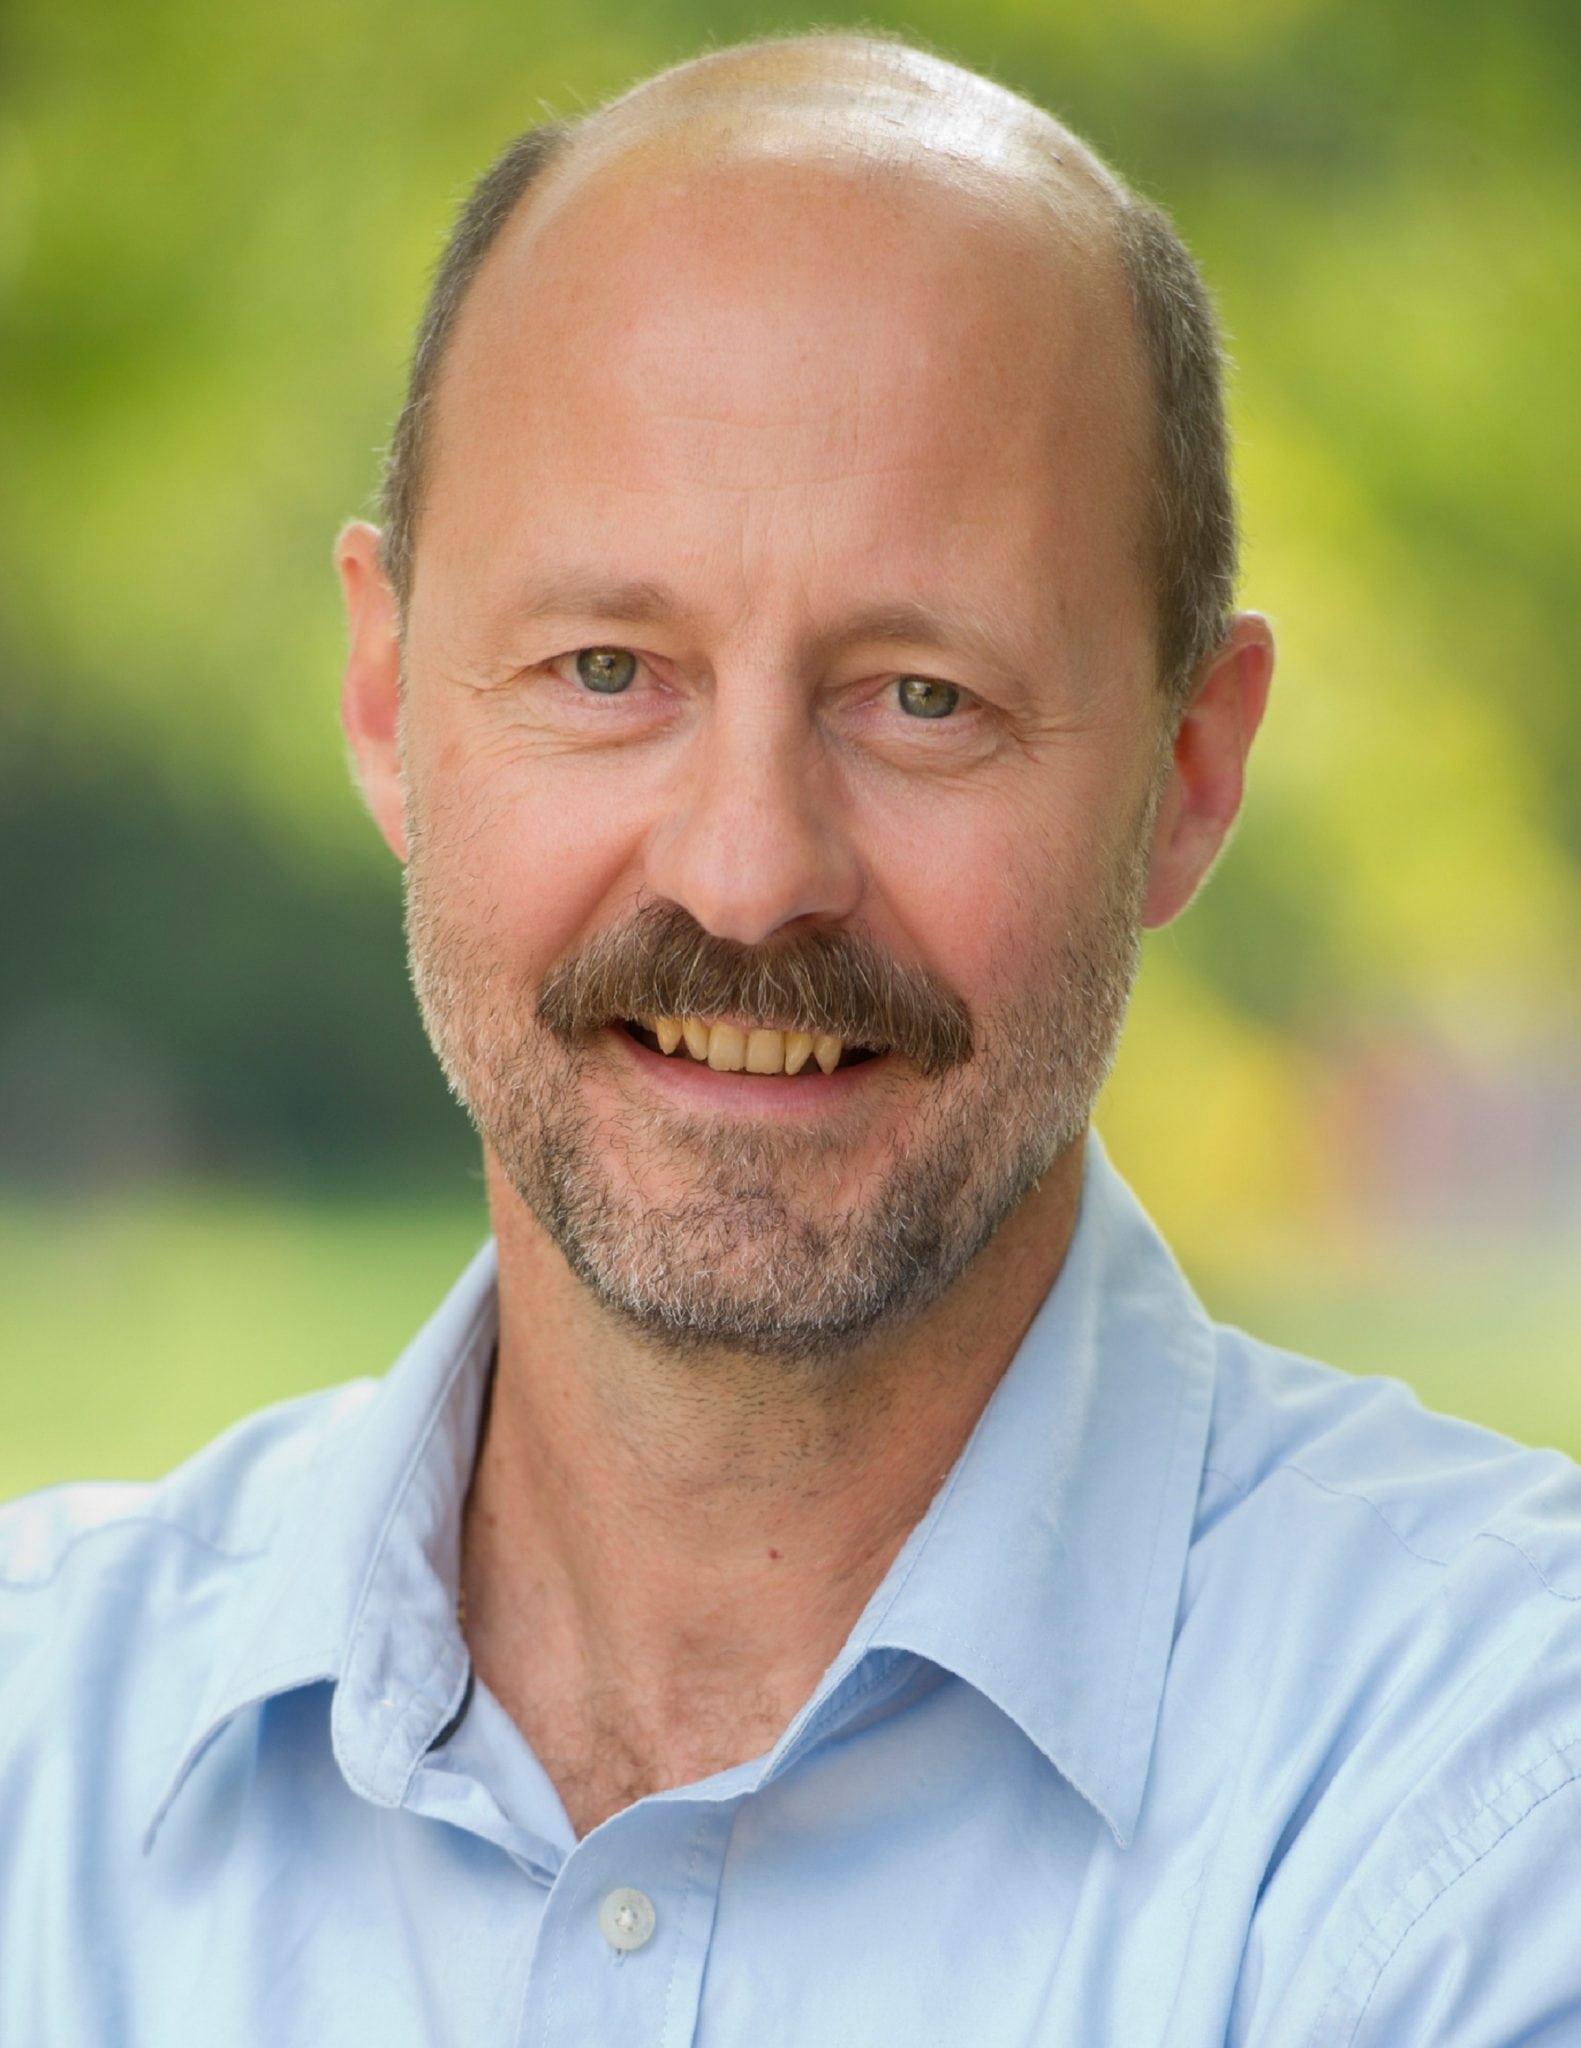 Photo of Prof. Flavio Schenkel smiling at the camera